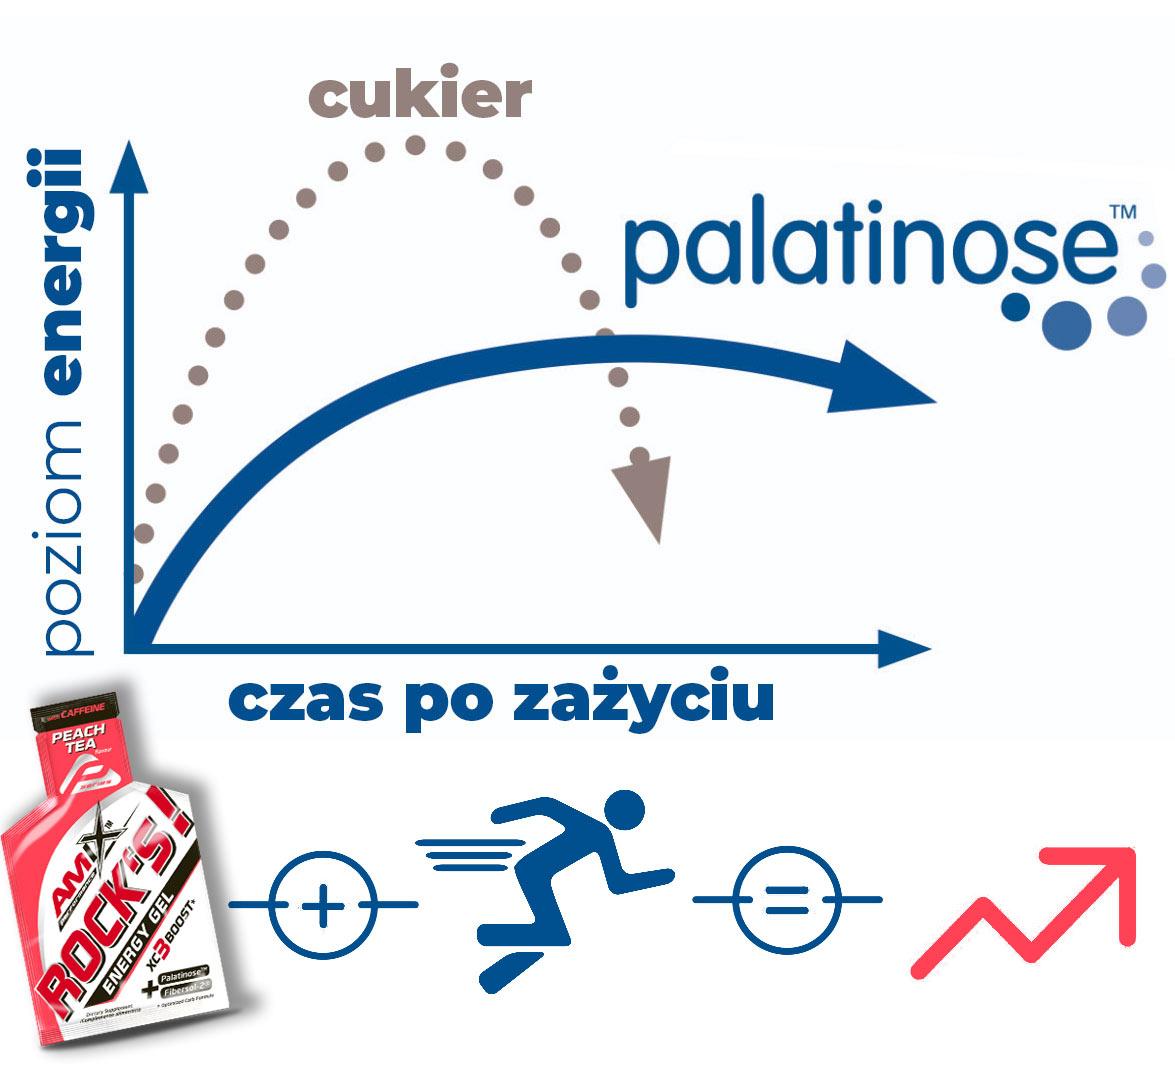 jaka działa palatynoza